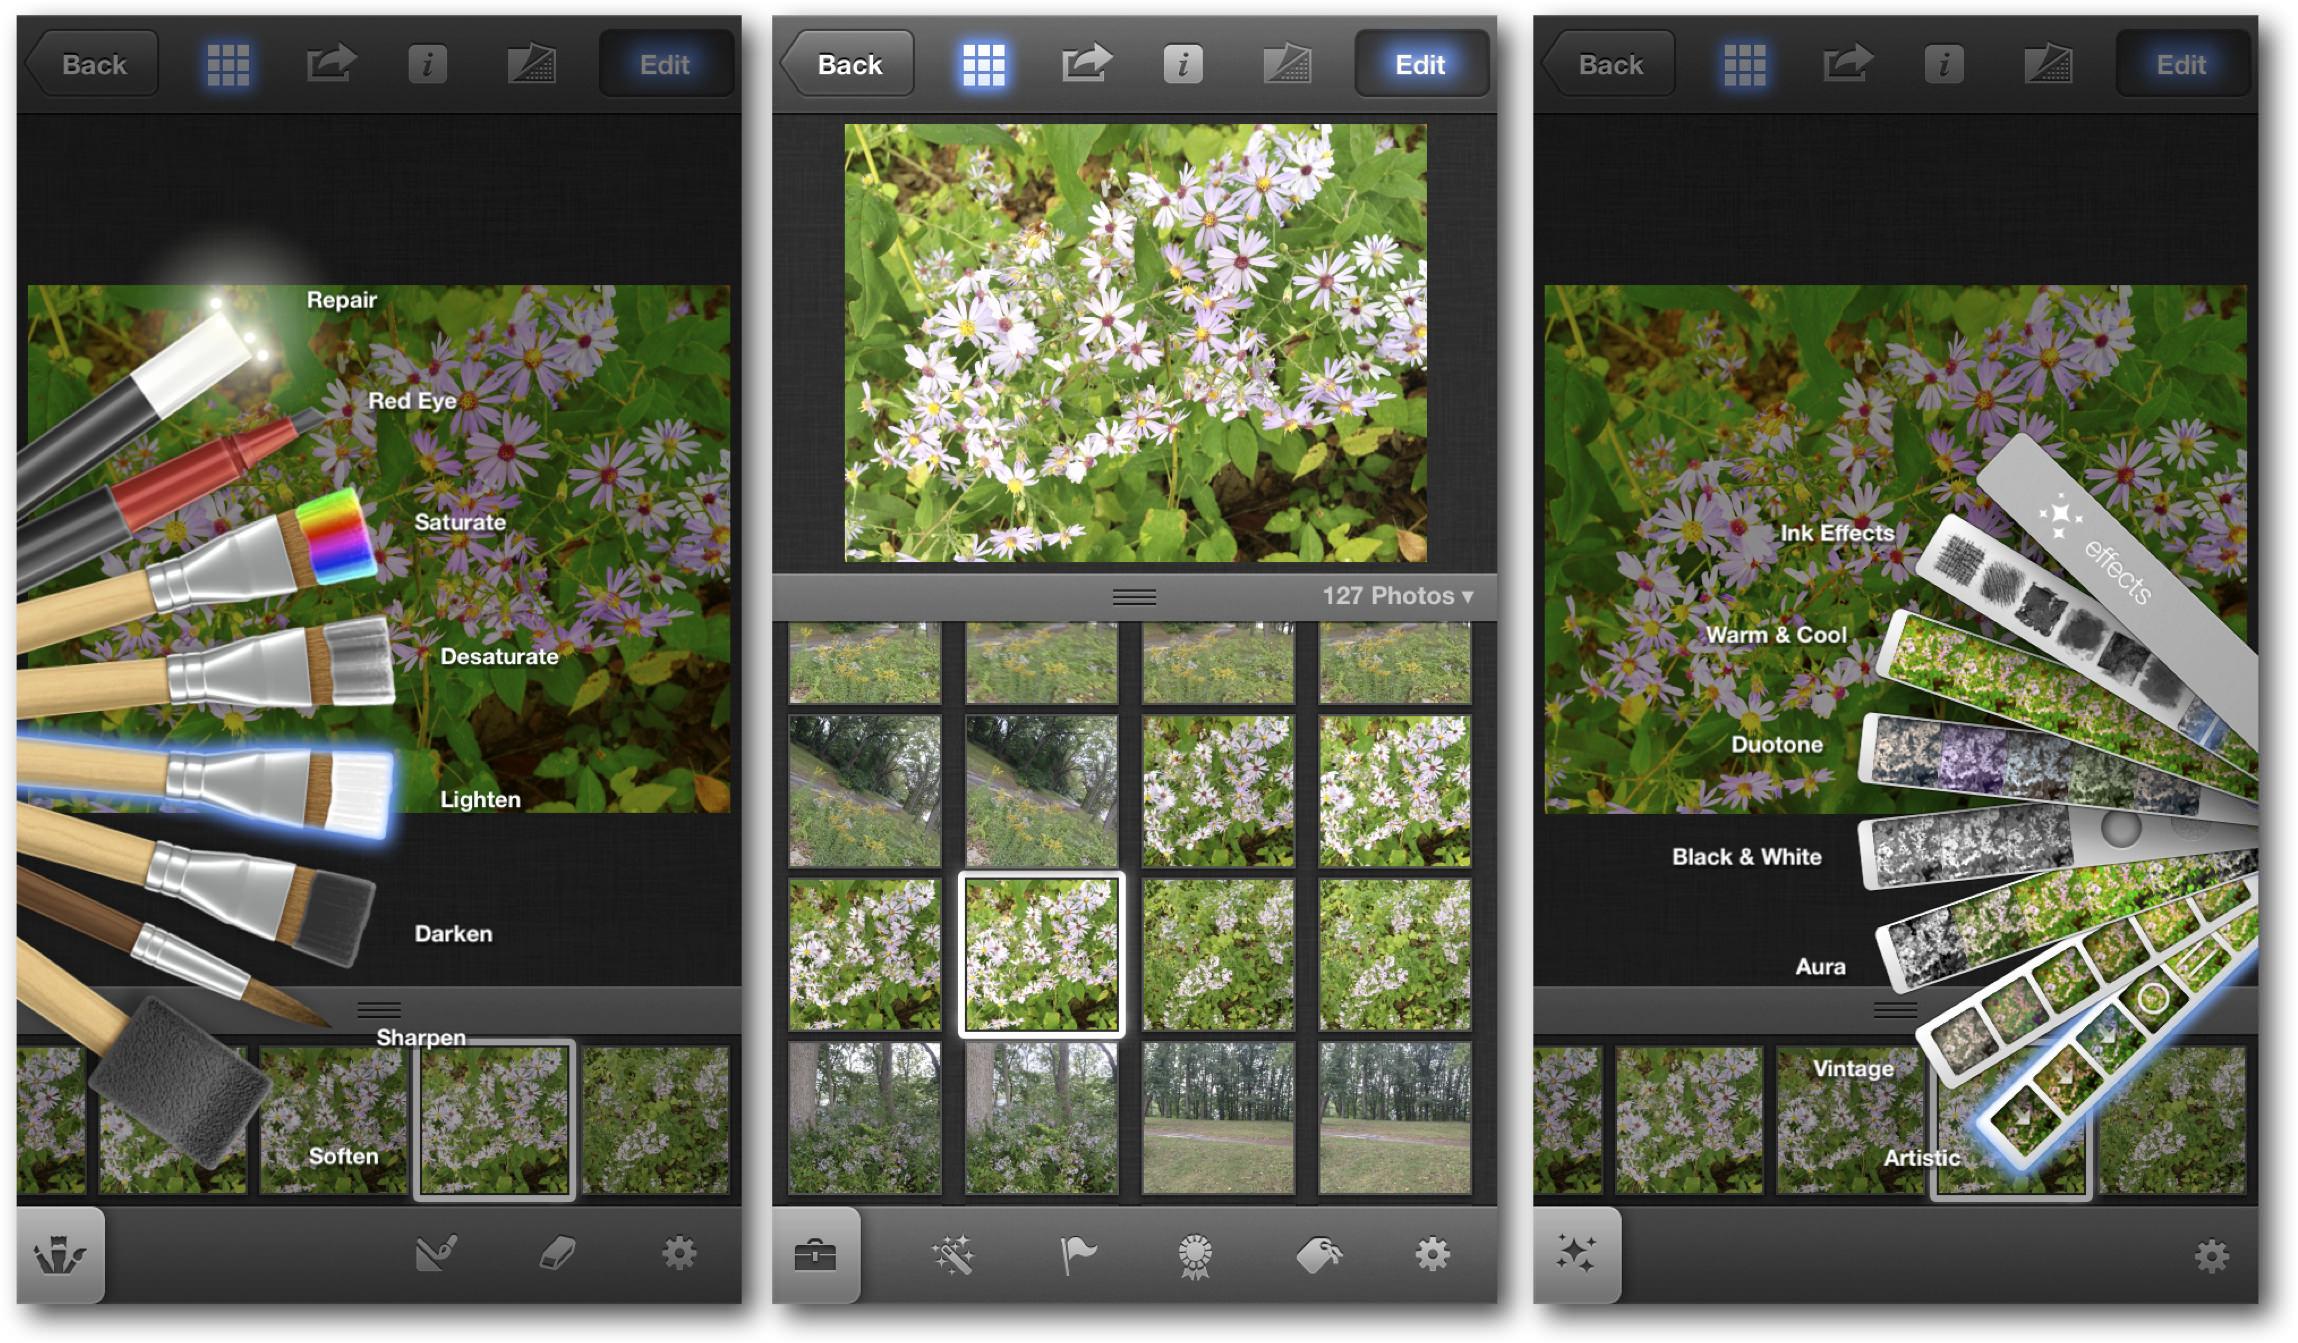 iOS 7 iPhoto Editing